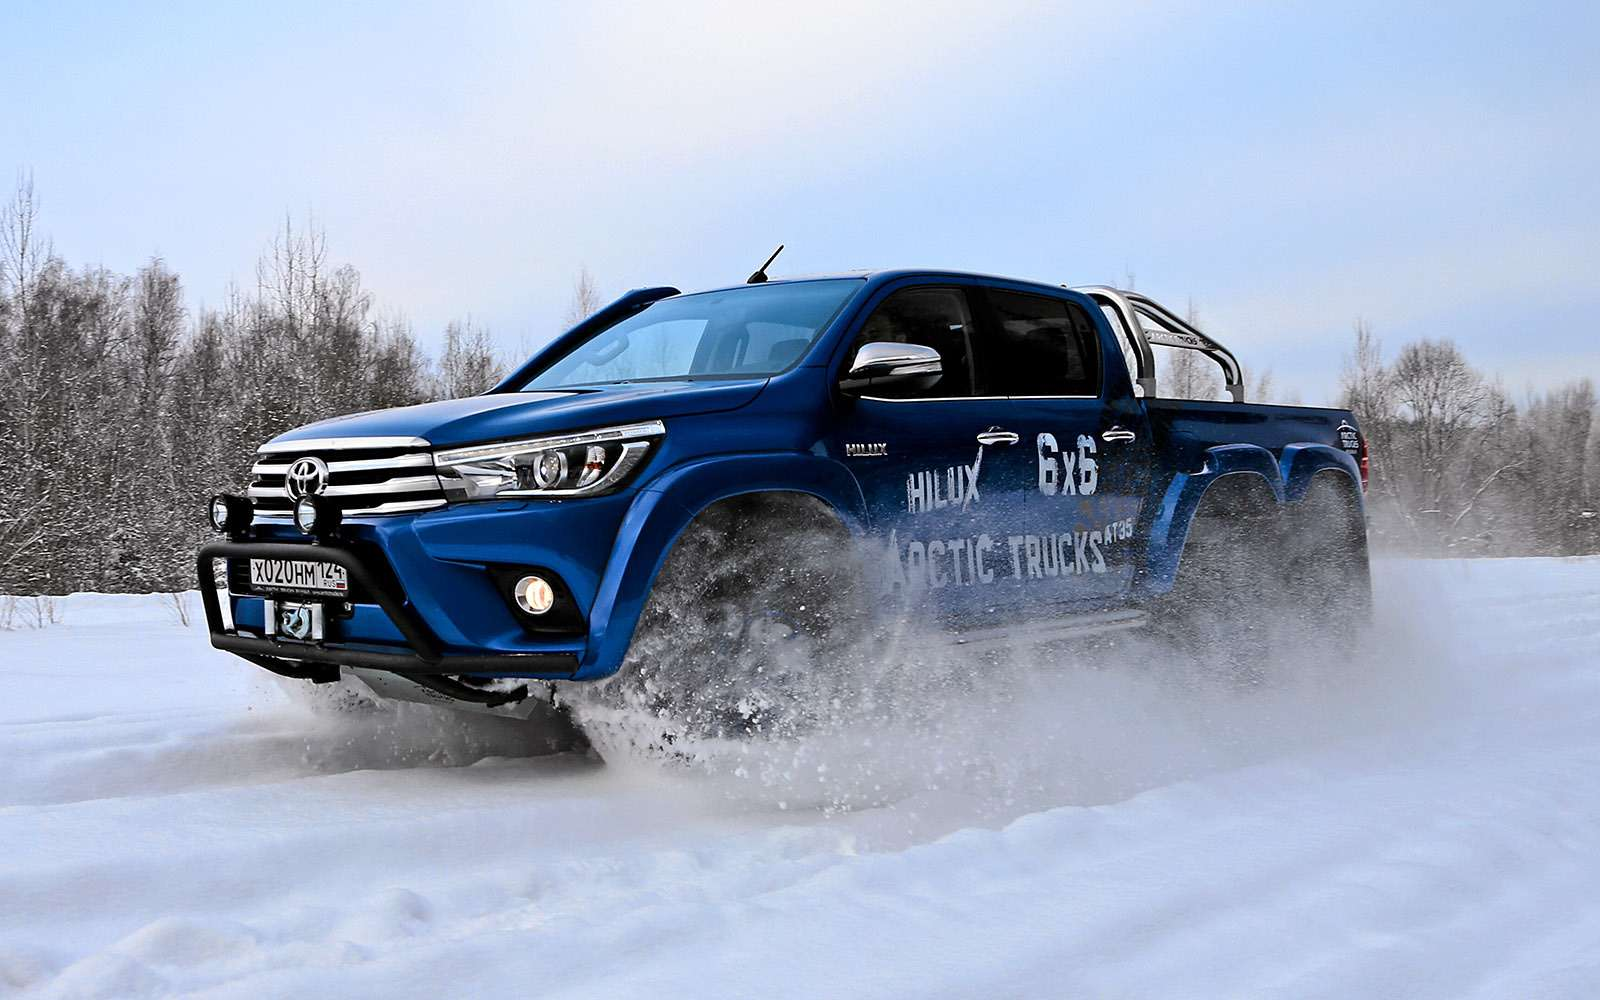 Пикапы Toyota Hilux Arctic Trucks: 4х4или 6х6?— фото 745686